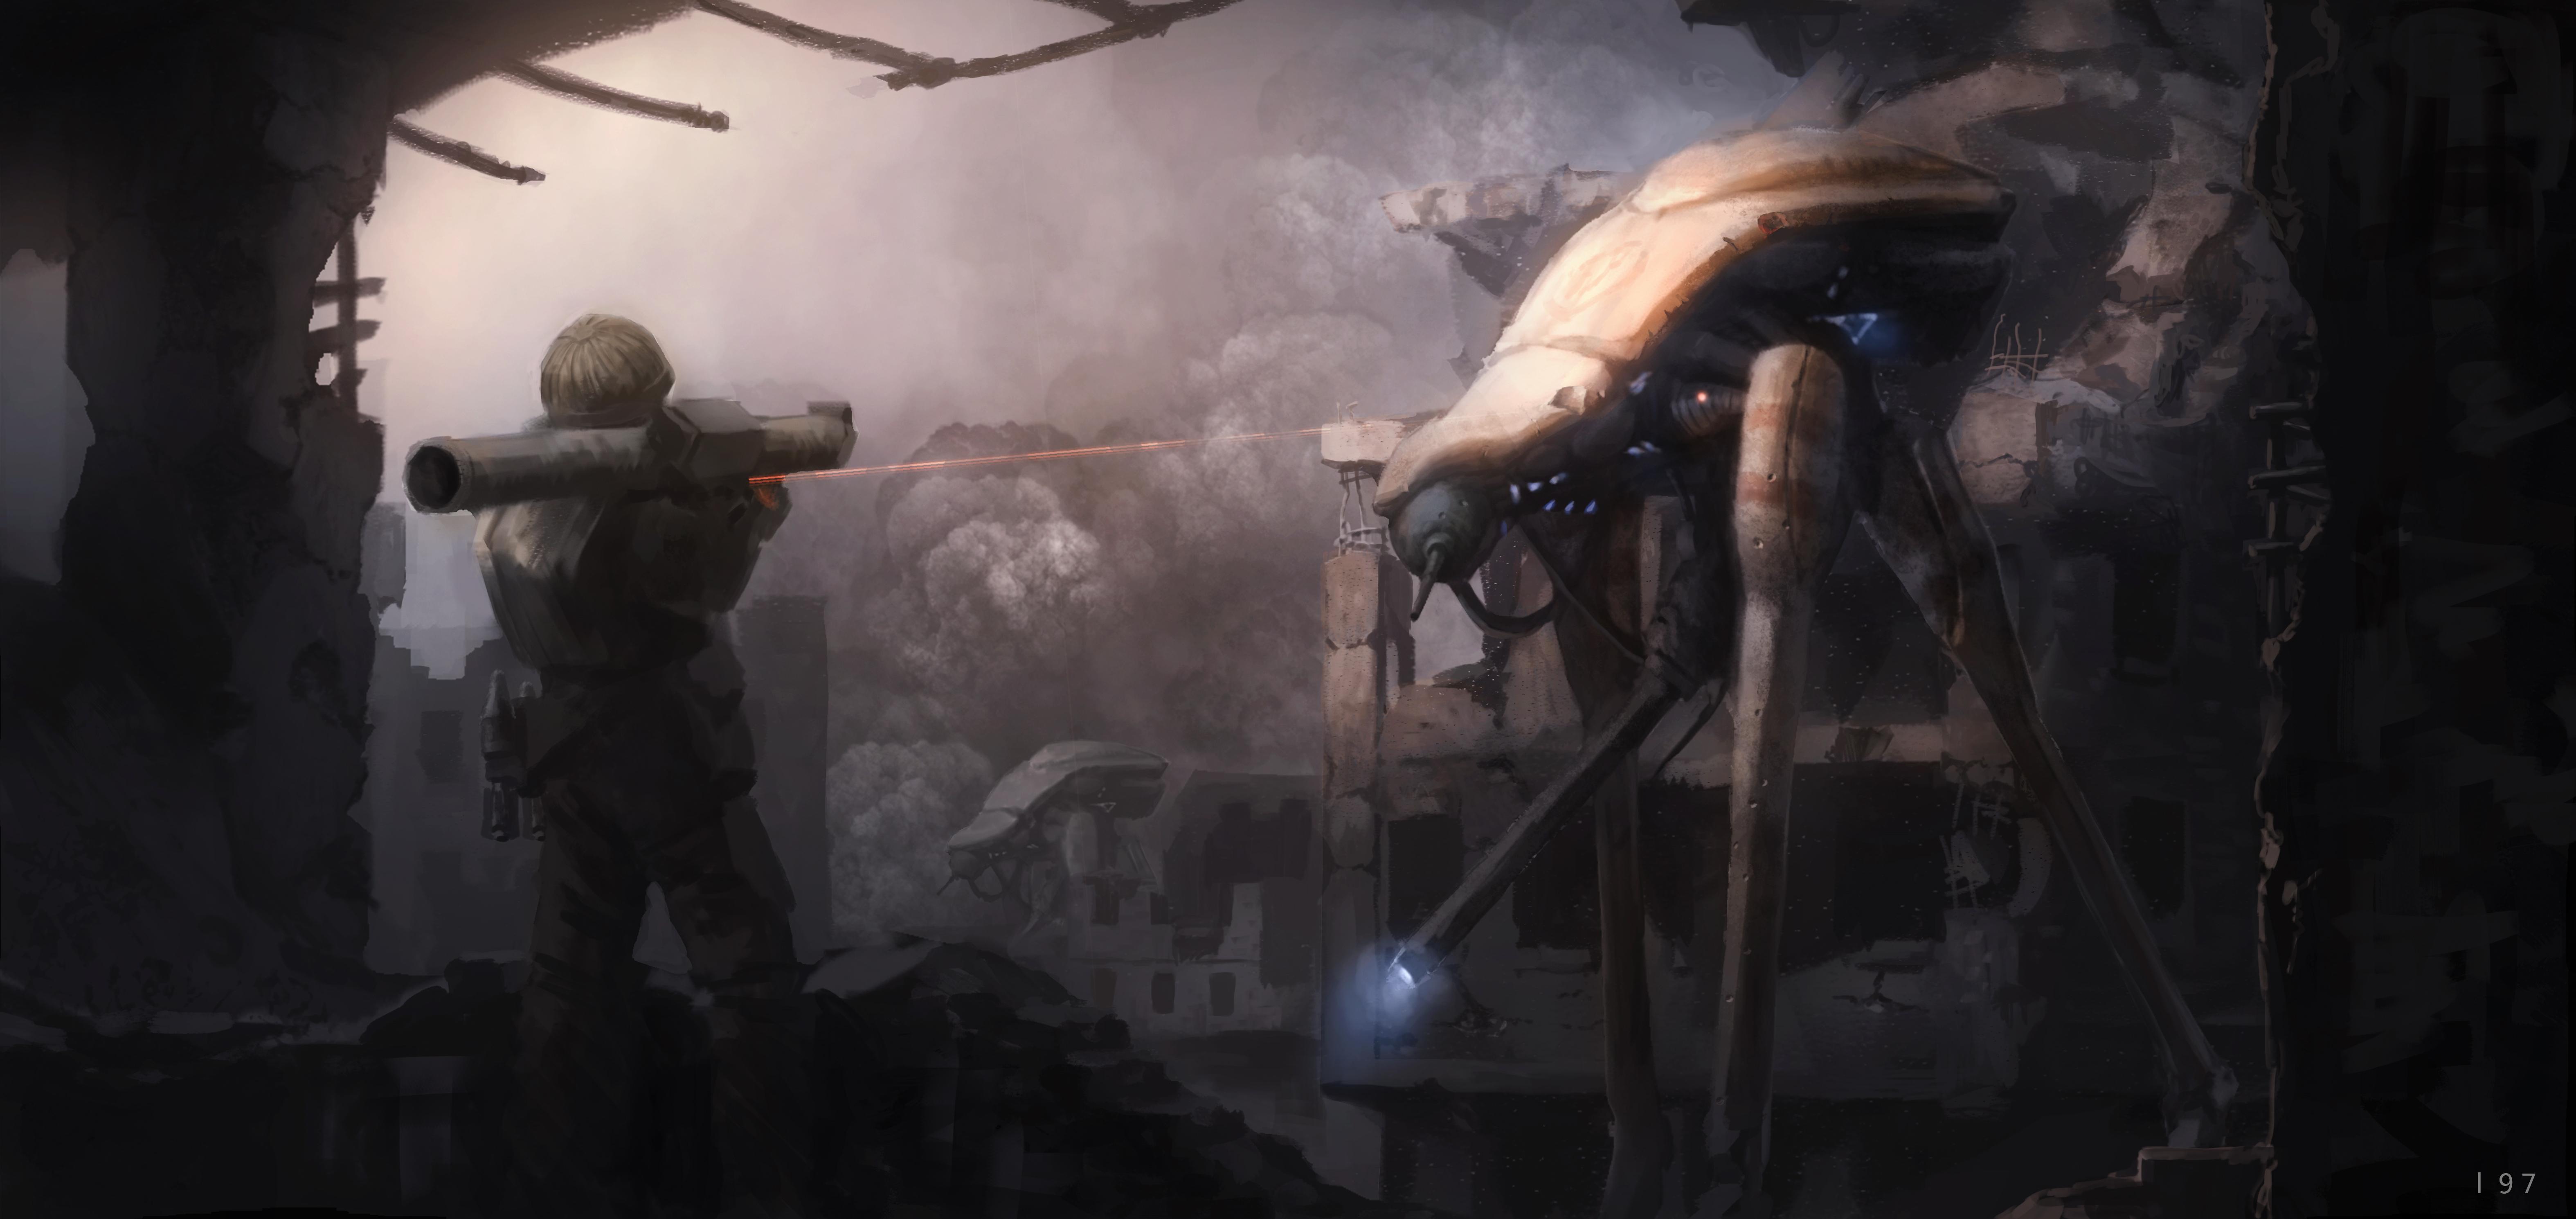 Half Life 2 5k Retina Ultra Hd Wallpaper Background Image